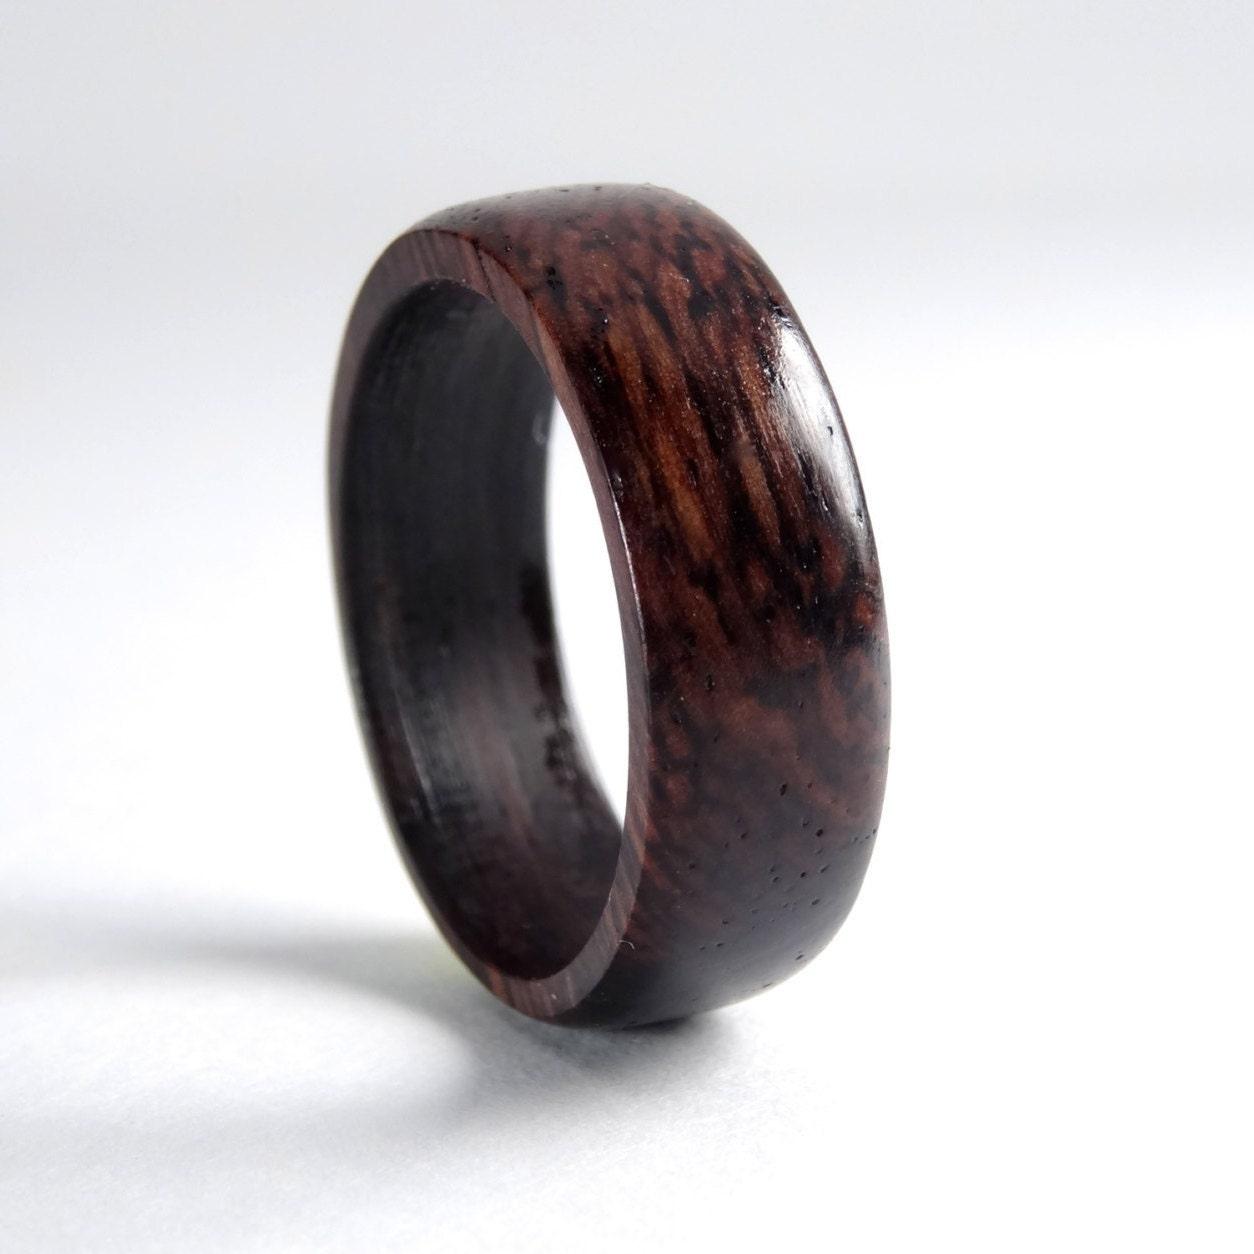 anneau en bois palissandre des indes bijoux en bois. Black Bedroom Furniture Sets. Home Design Ideas